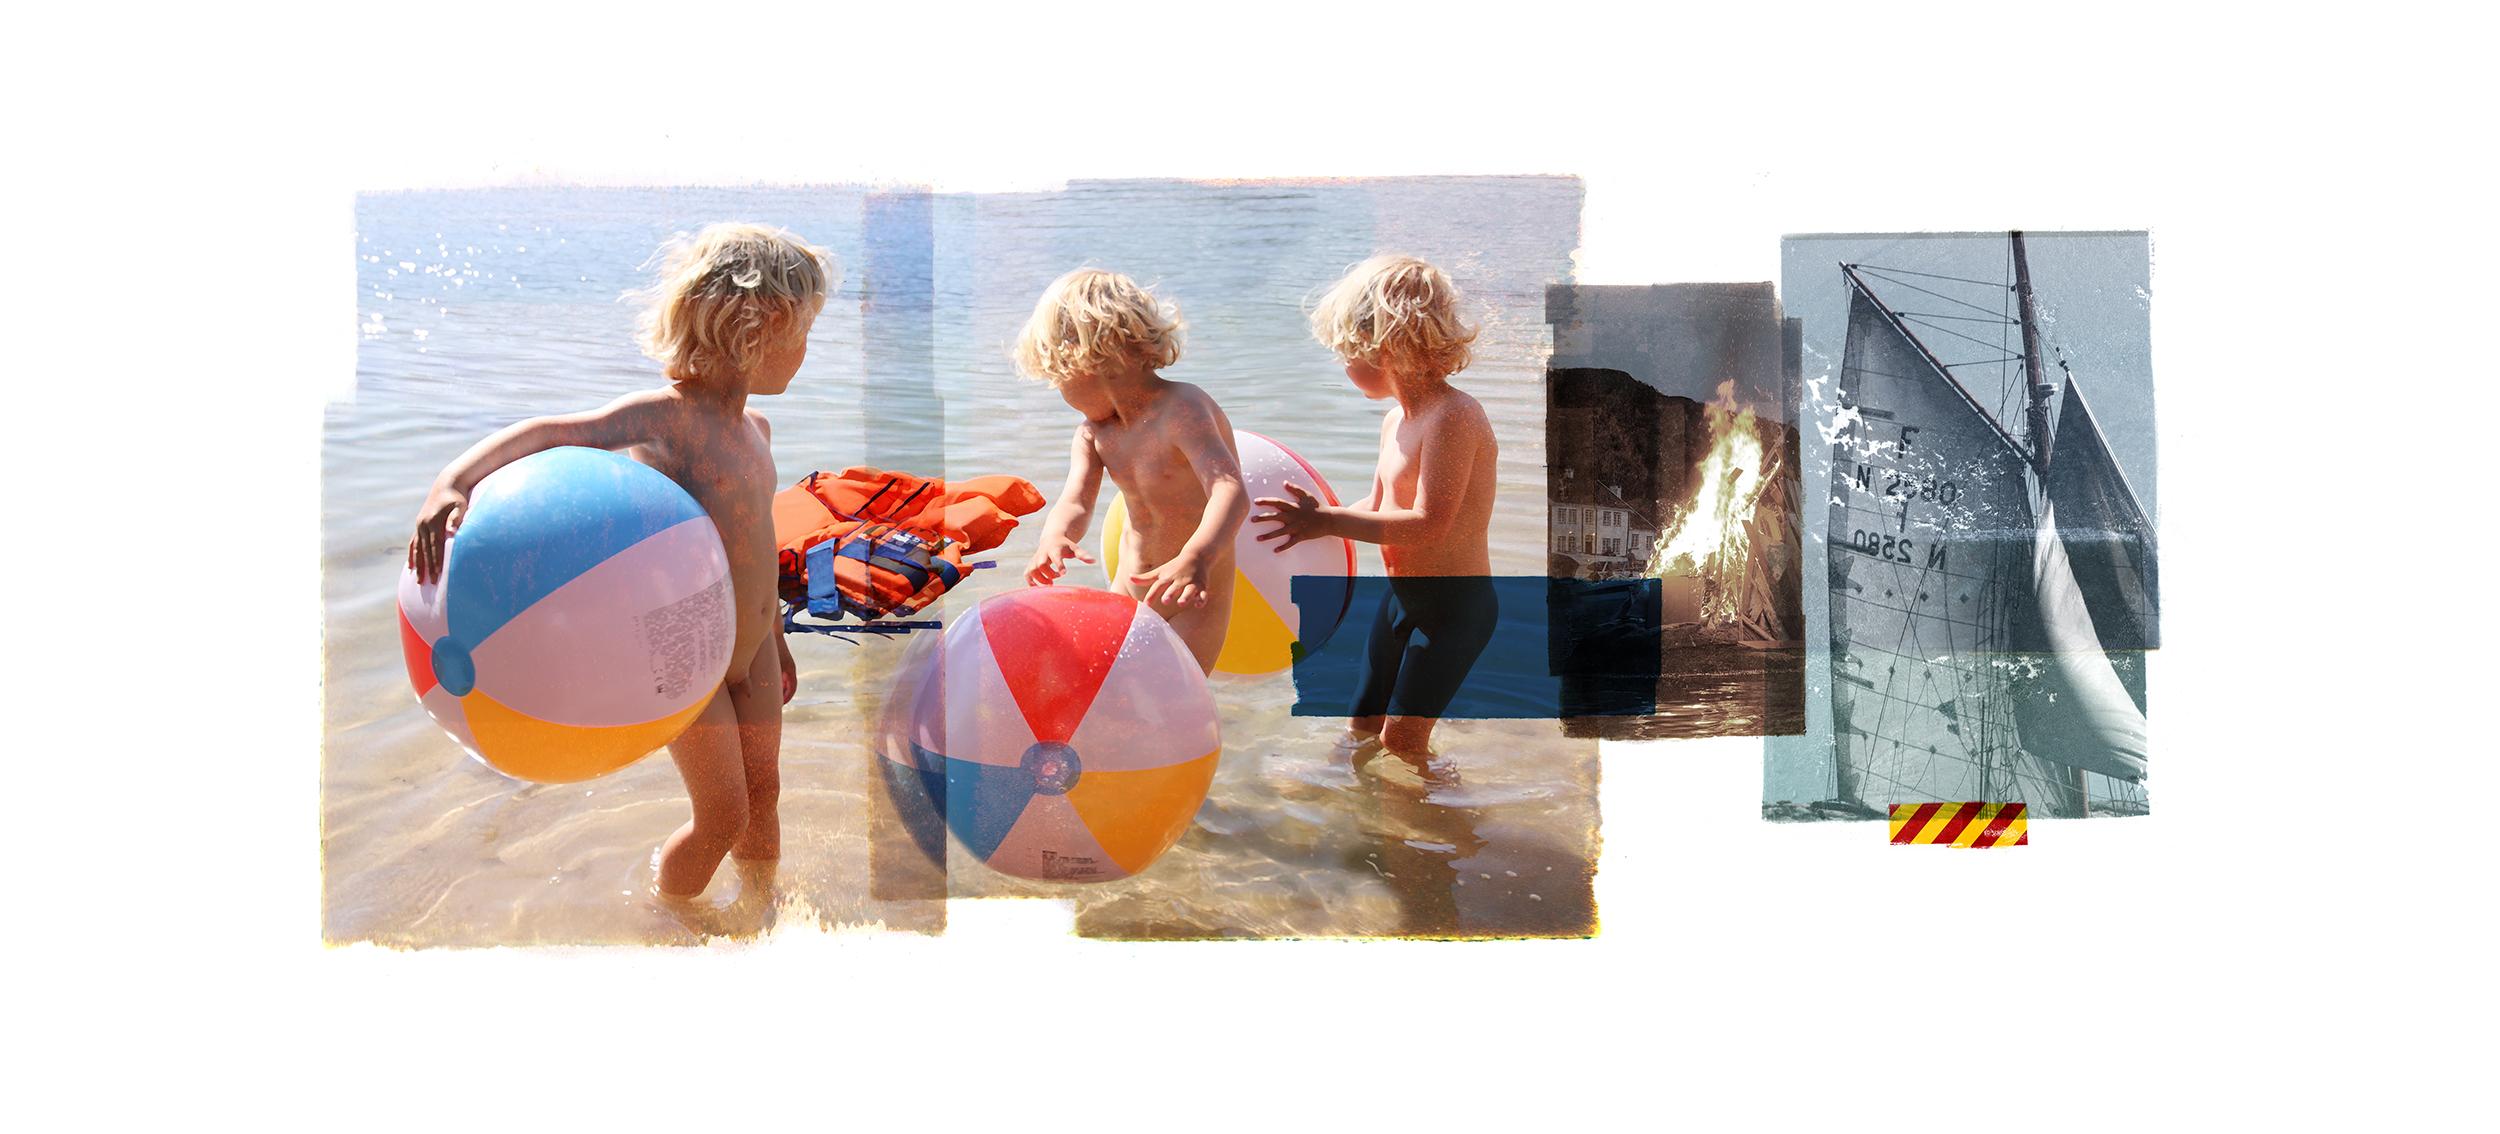 Buoyancy / Olsok / Second Wind   Original Pigment Print/ BFK Rives 250 gr 56 x 25 cm / 22 x 9,8 in Edition of 50 + 7 Ap Editeur: Per Fronth Studios / Printer Henrik Aunevik  20/2016: